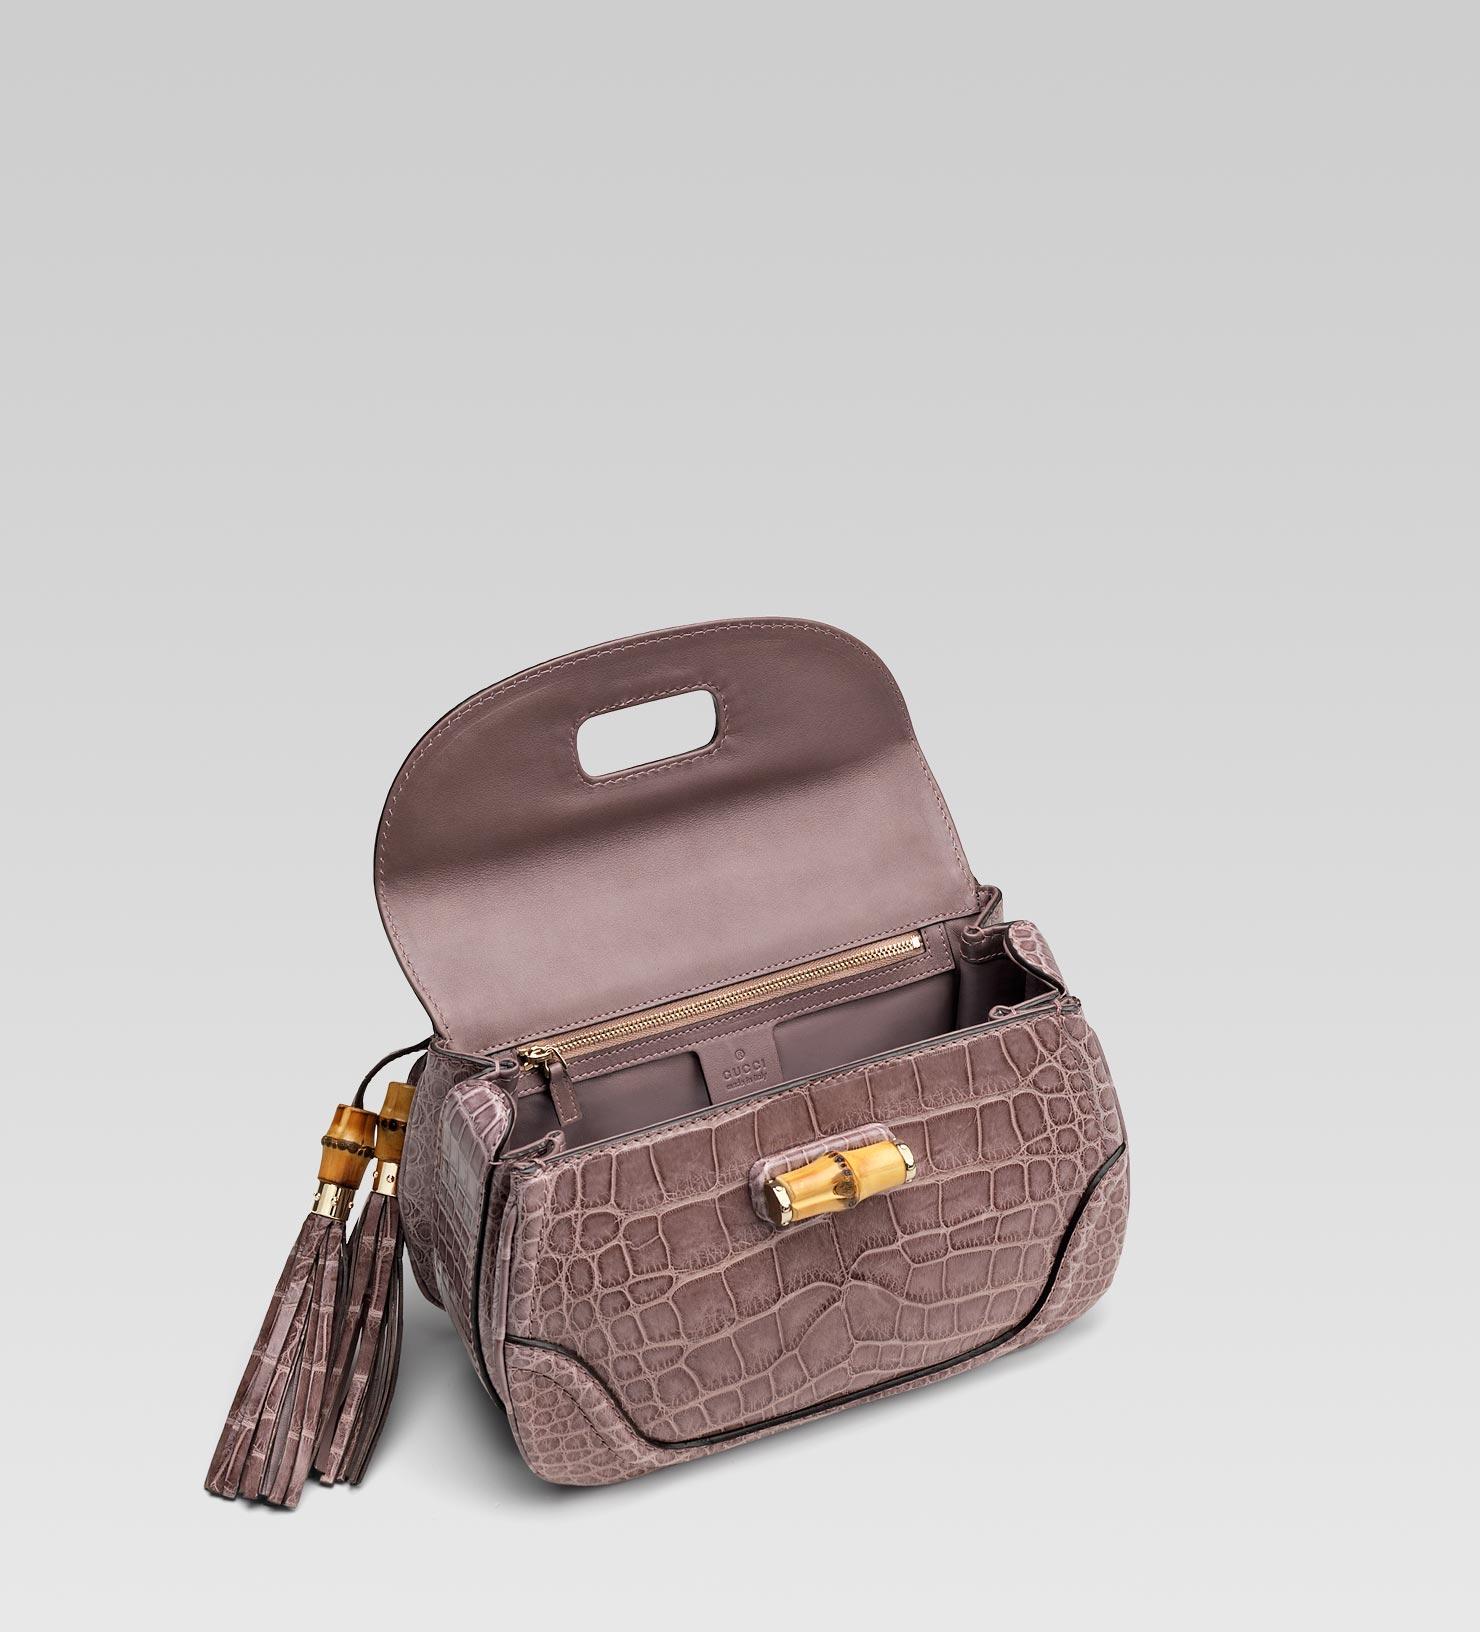 a2f2f5068605 Gucci New Bamboo Crocodile Top Handle Bag in Purple - Lyst